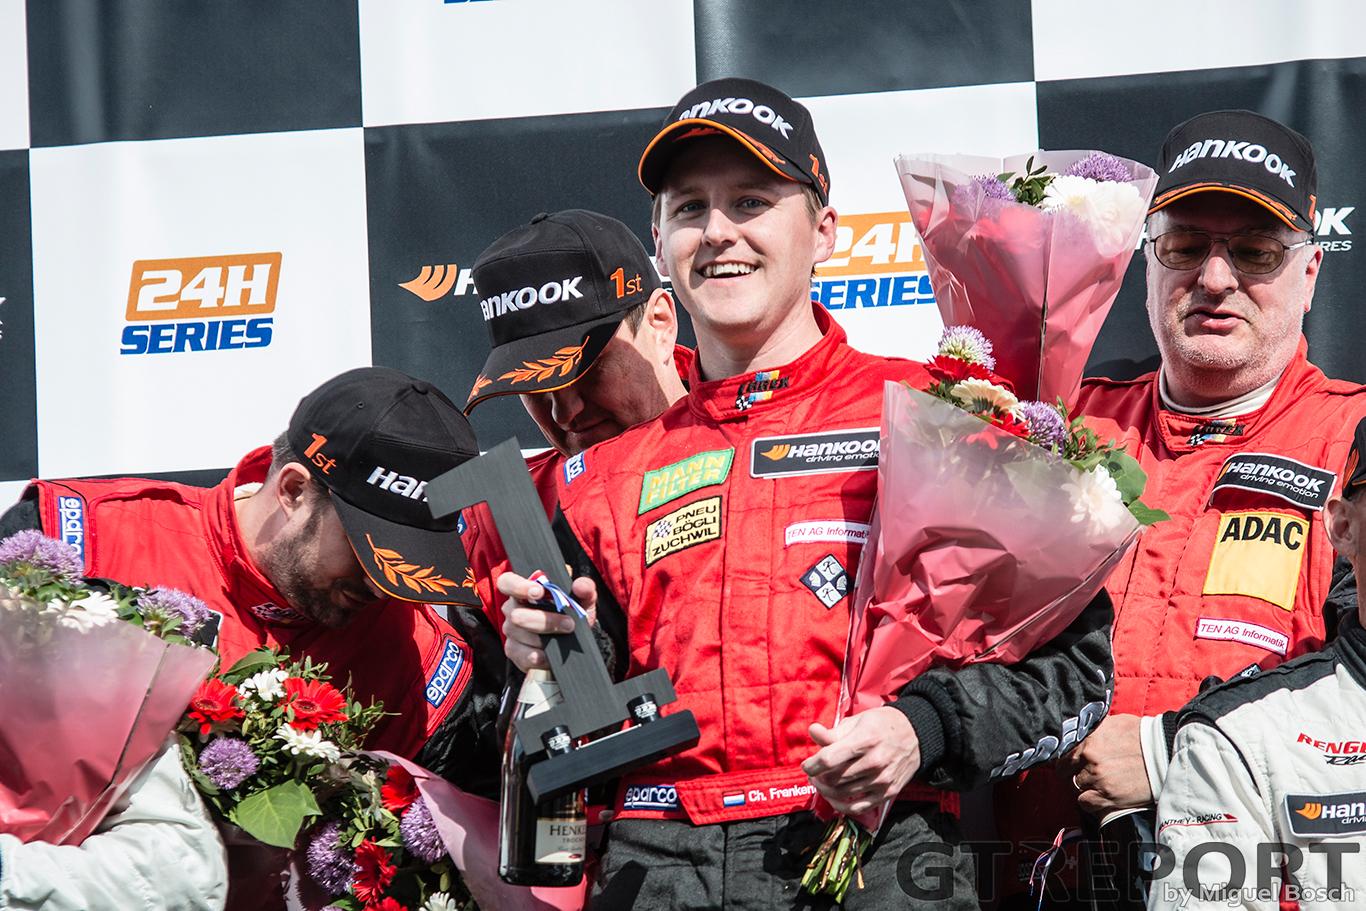 Weekend round-up: IMSA, PWC, British GT, Zandvoort 12H